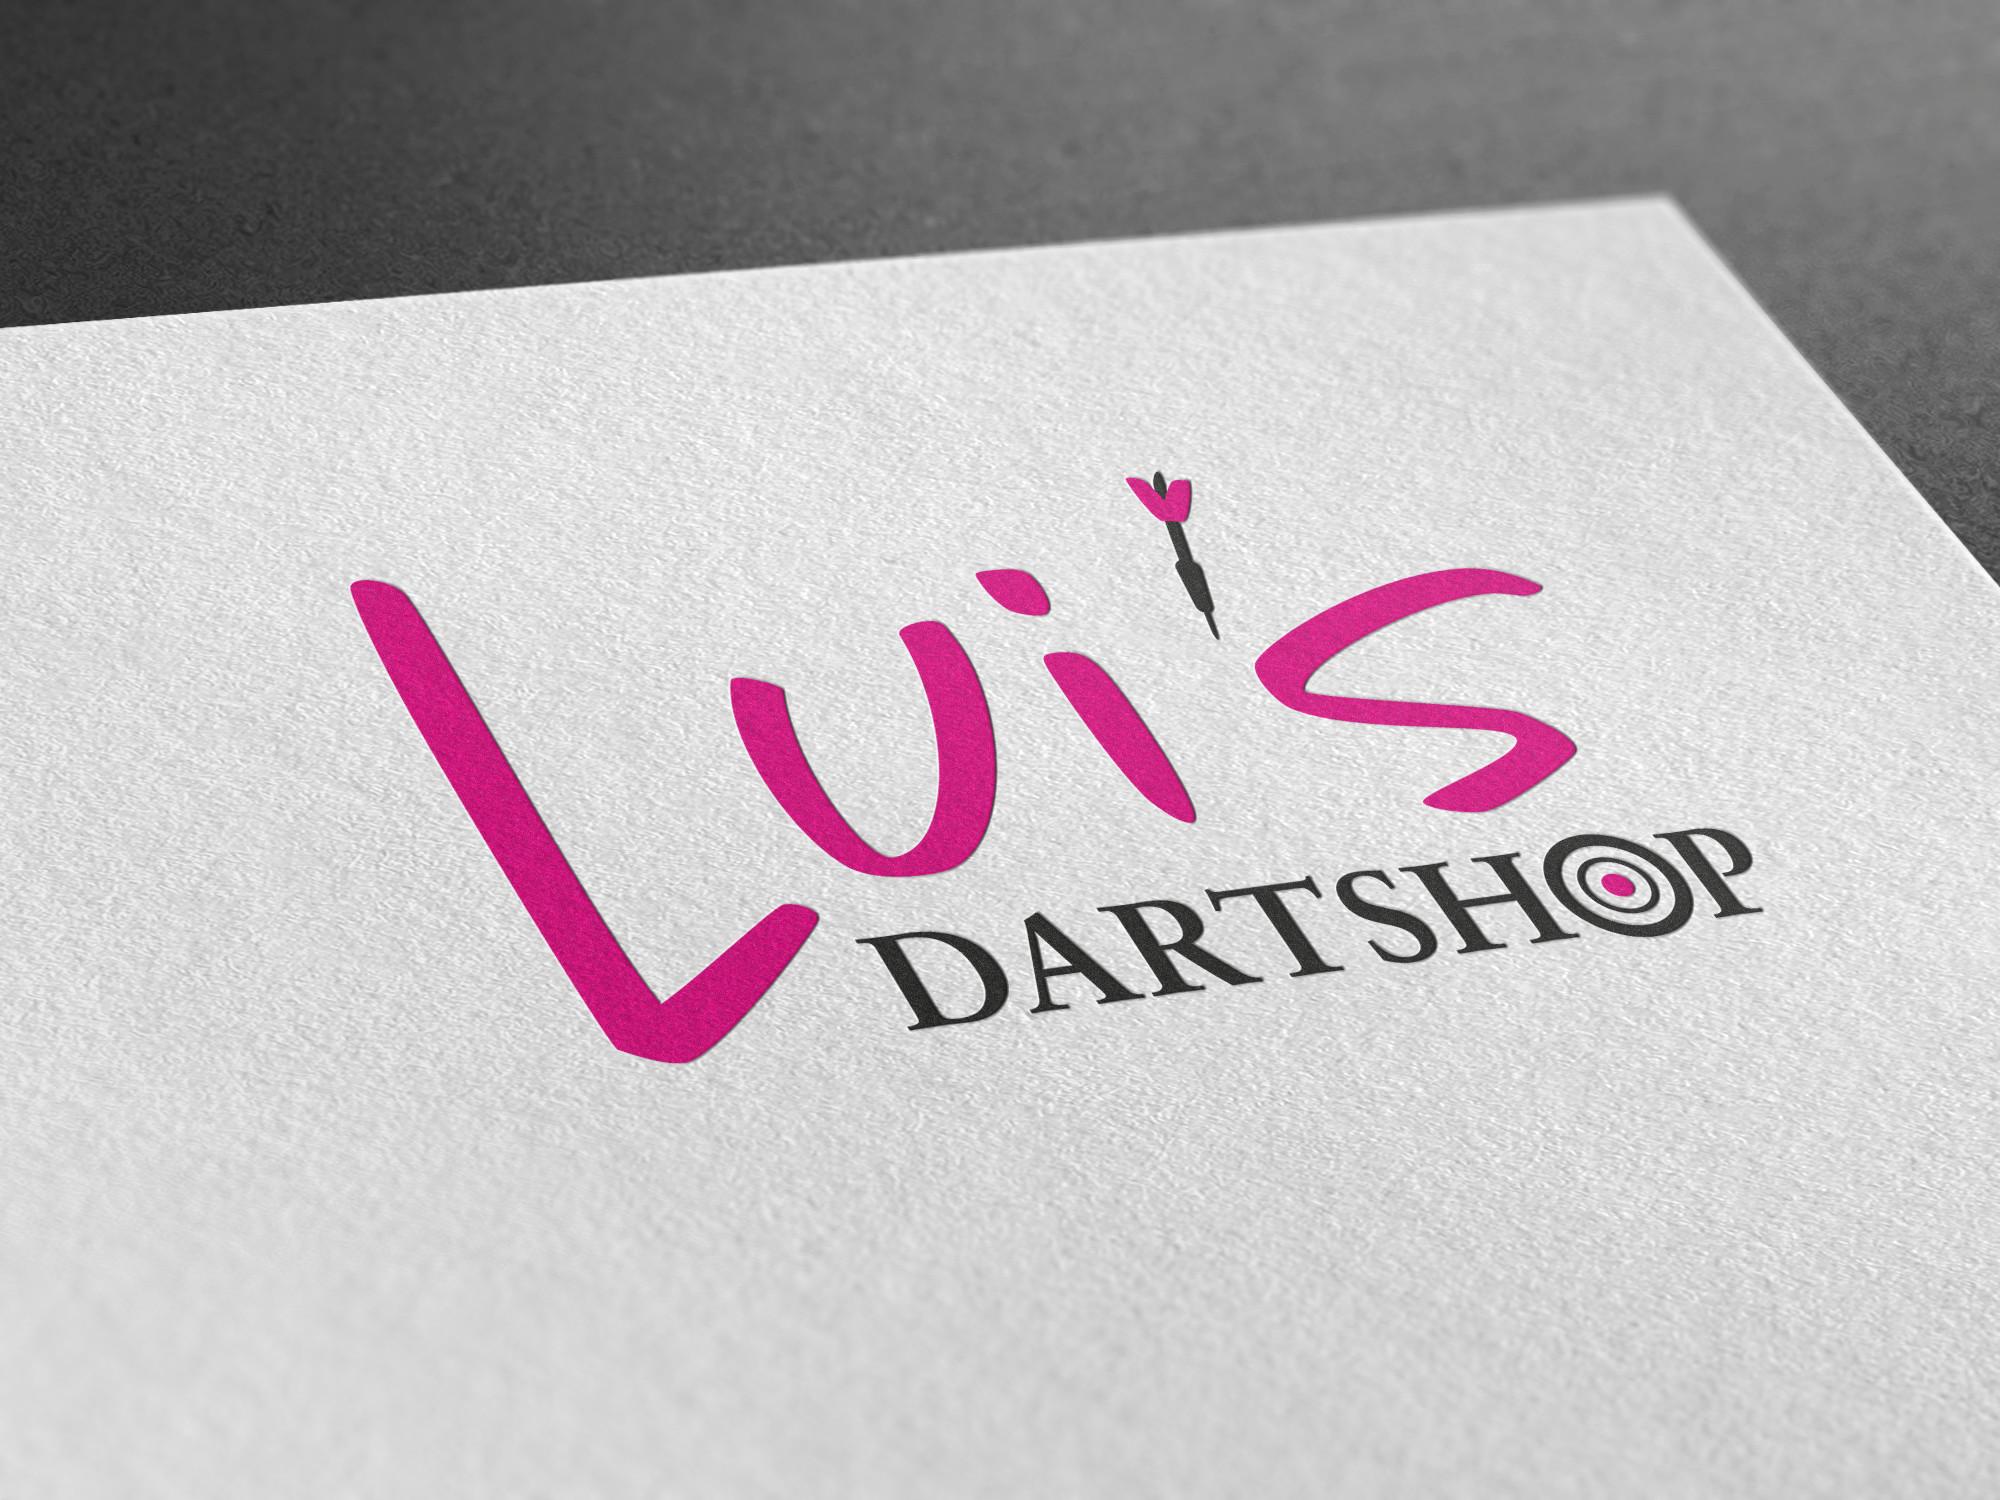 Luis Dartshop visualisiert